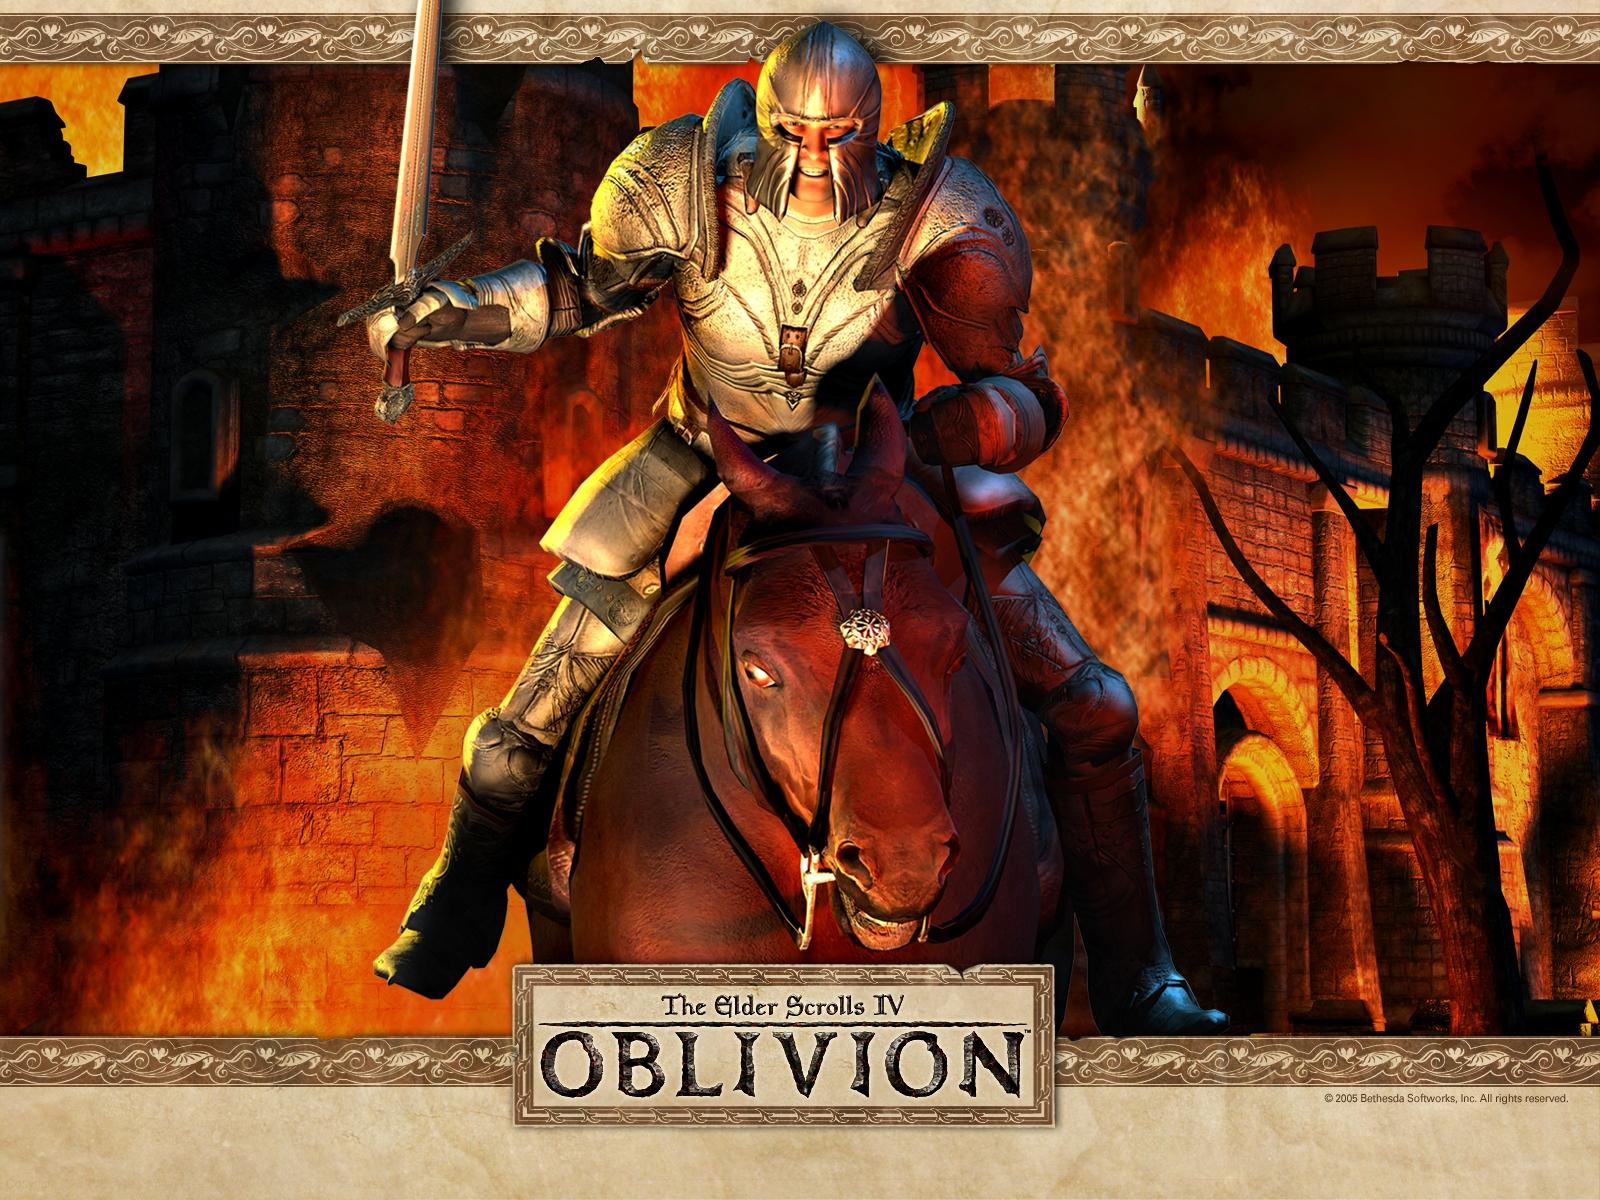 OB-wallpaper-The_Battle_of_Kvatch-1600x1200.jpg